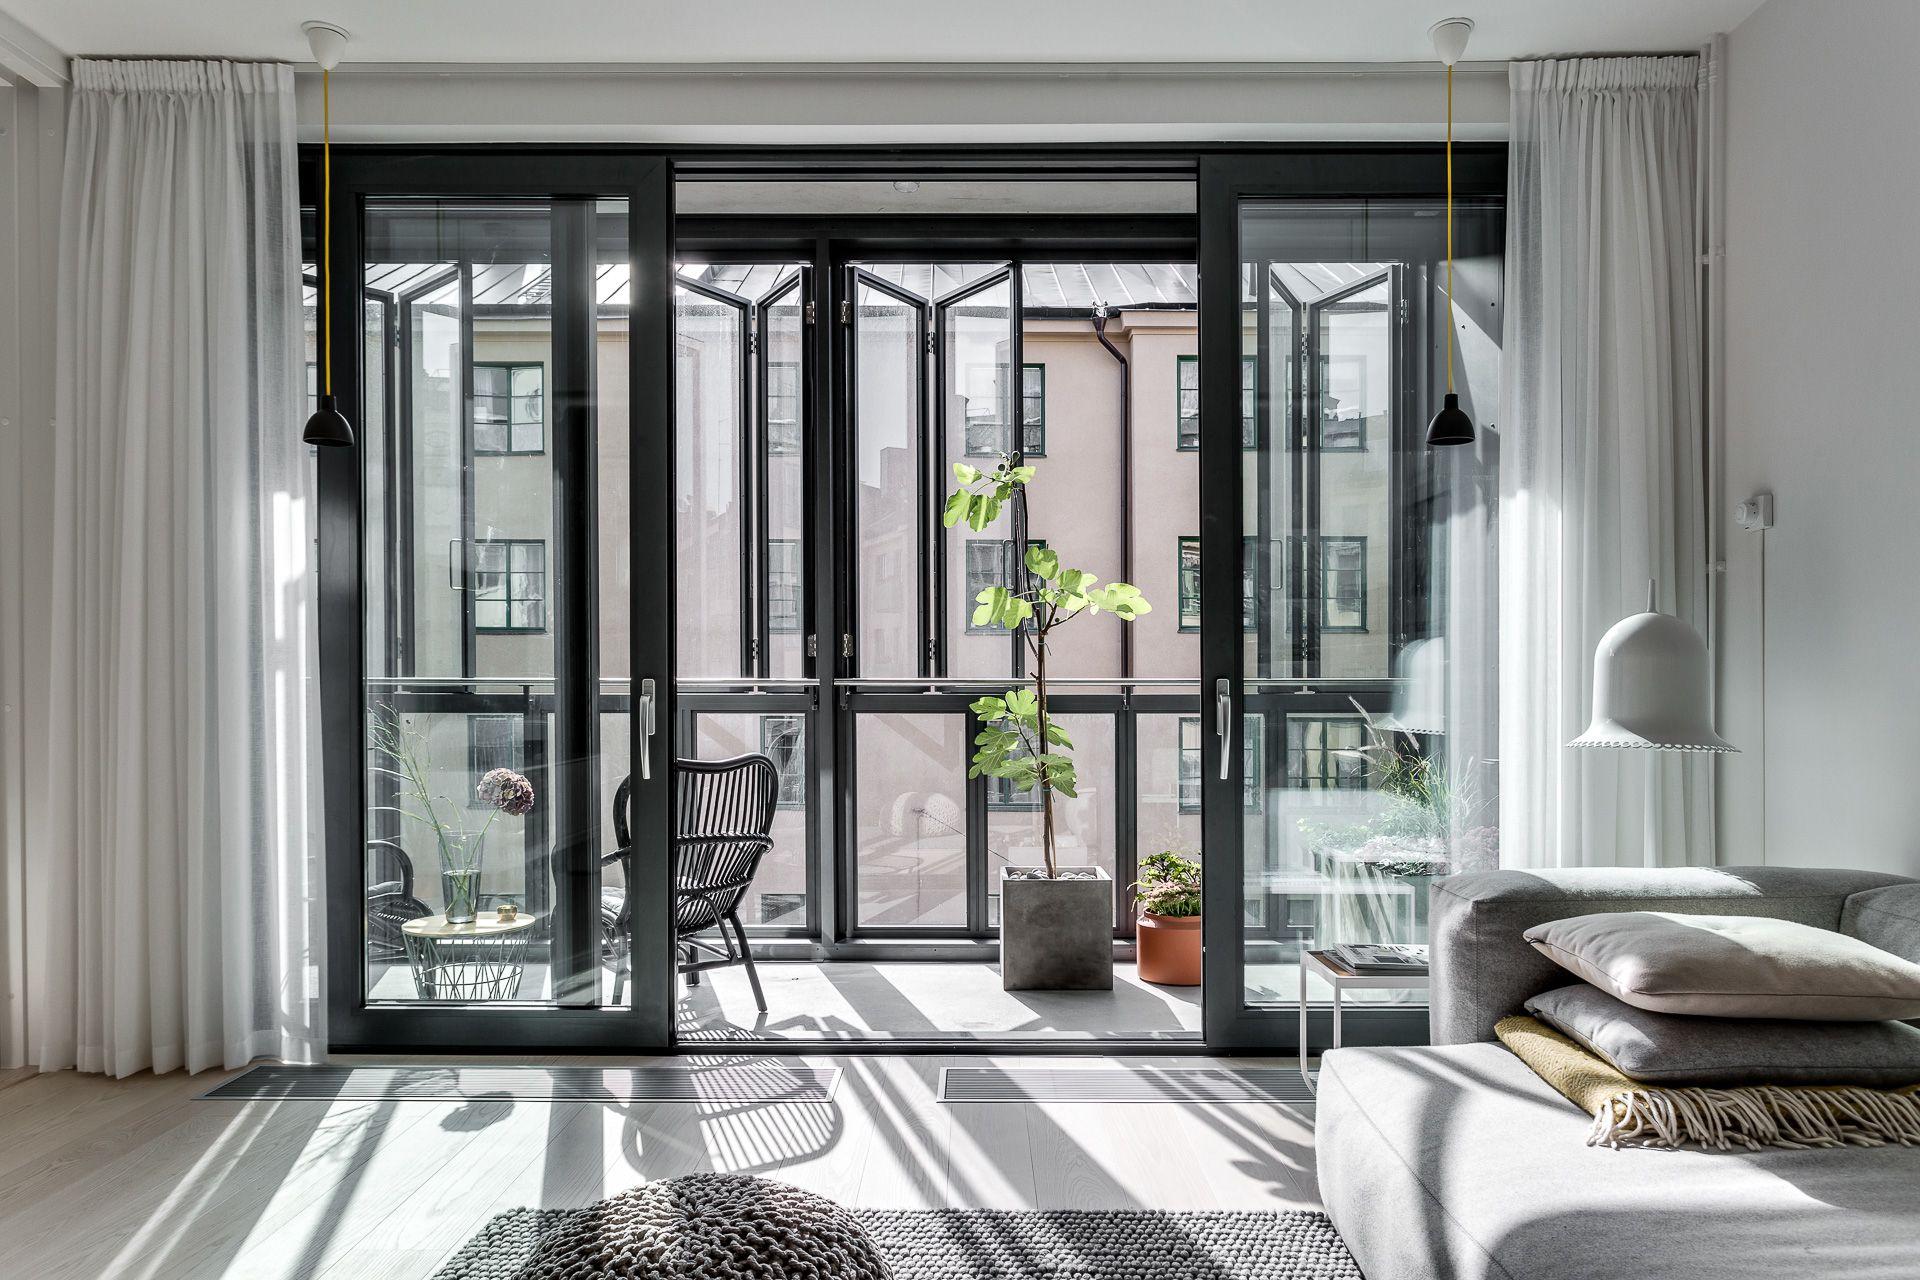 Un Balcon Veranda Lumineux Planete Deco Maison Et Deco